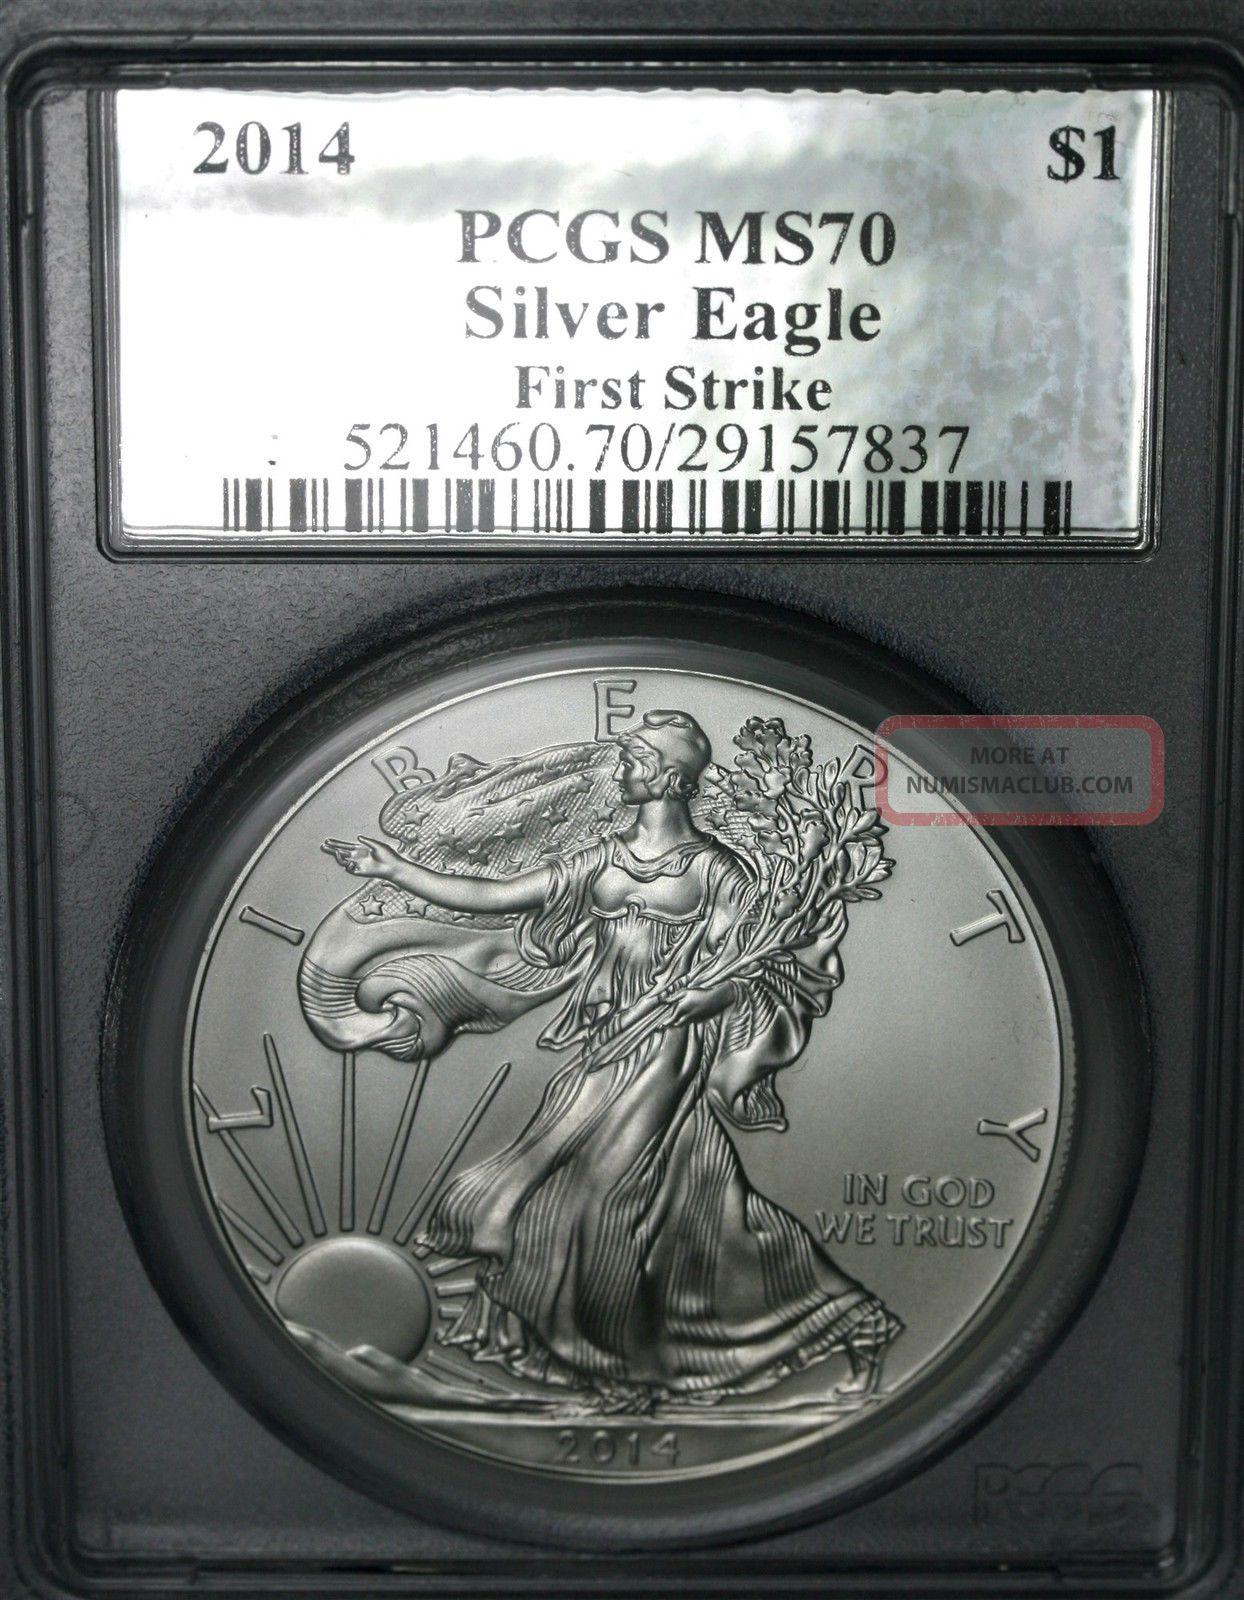 2014 Silver Eagle $1 Pcgs Ms70 First Strike Silver Foil Label Silver photo